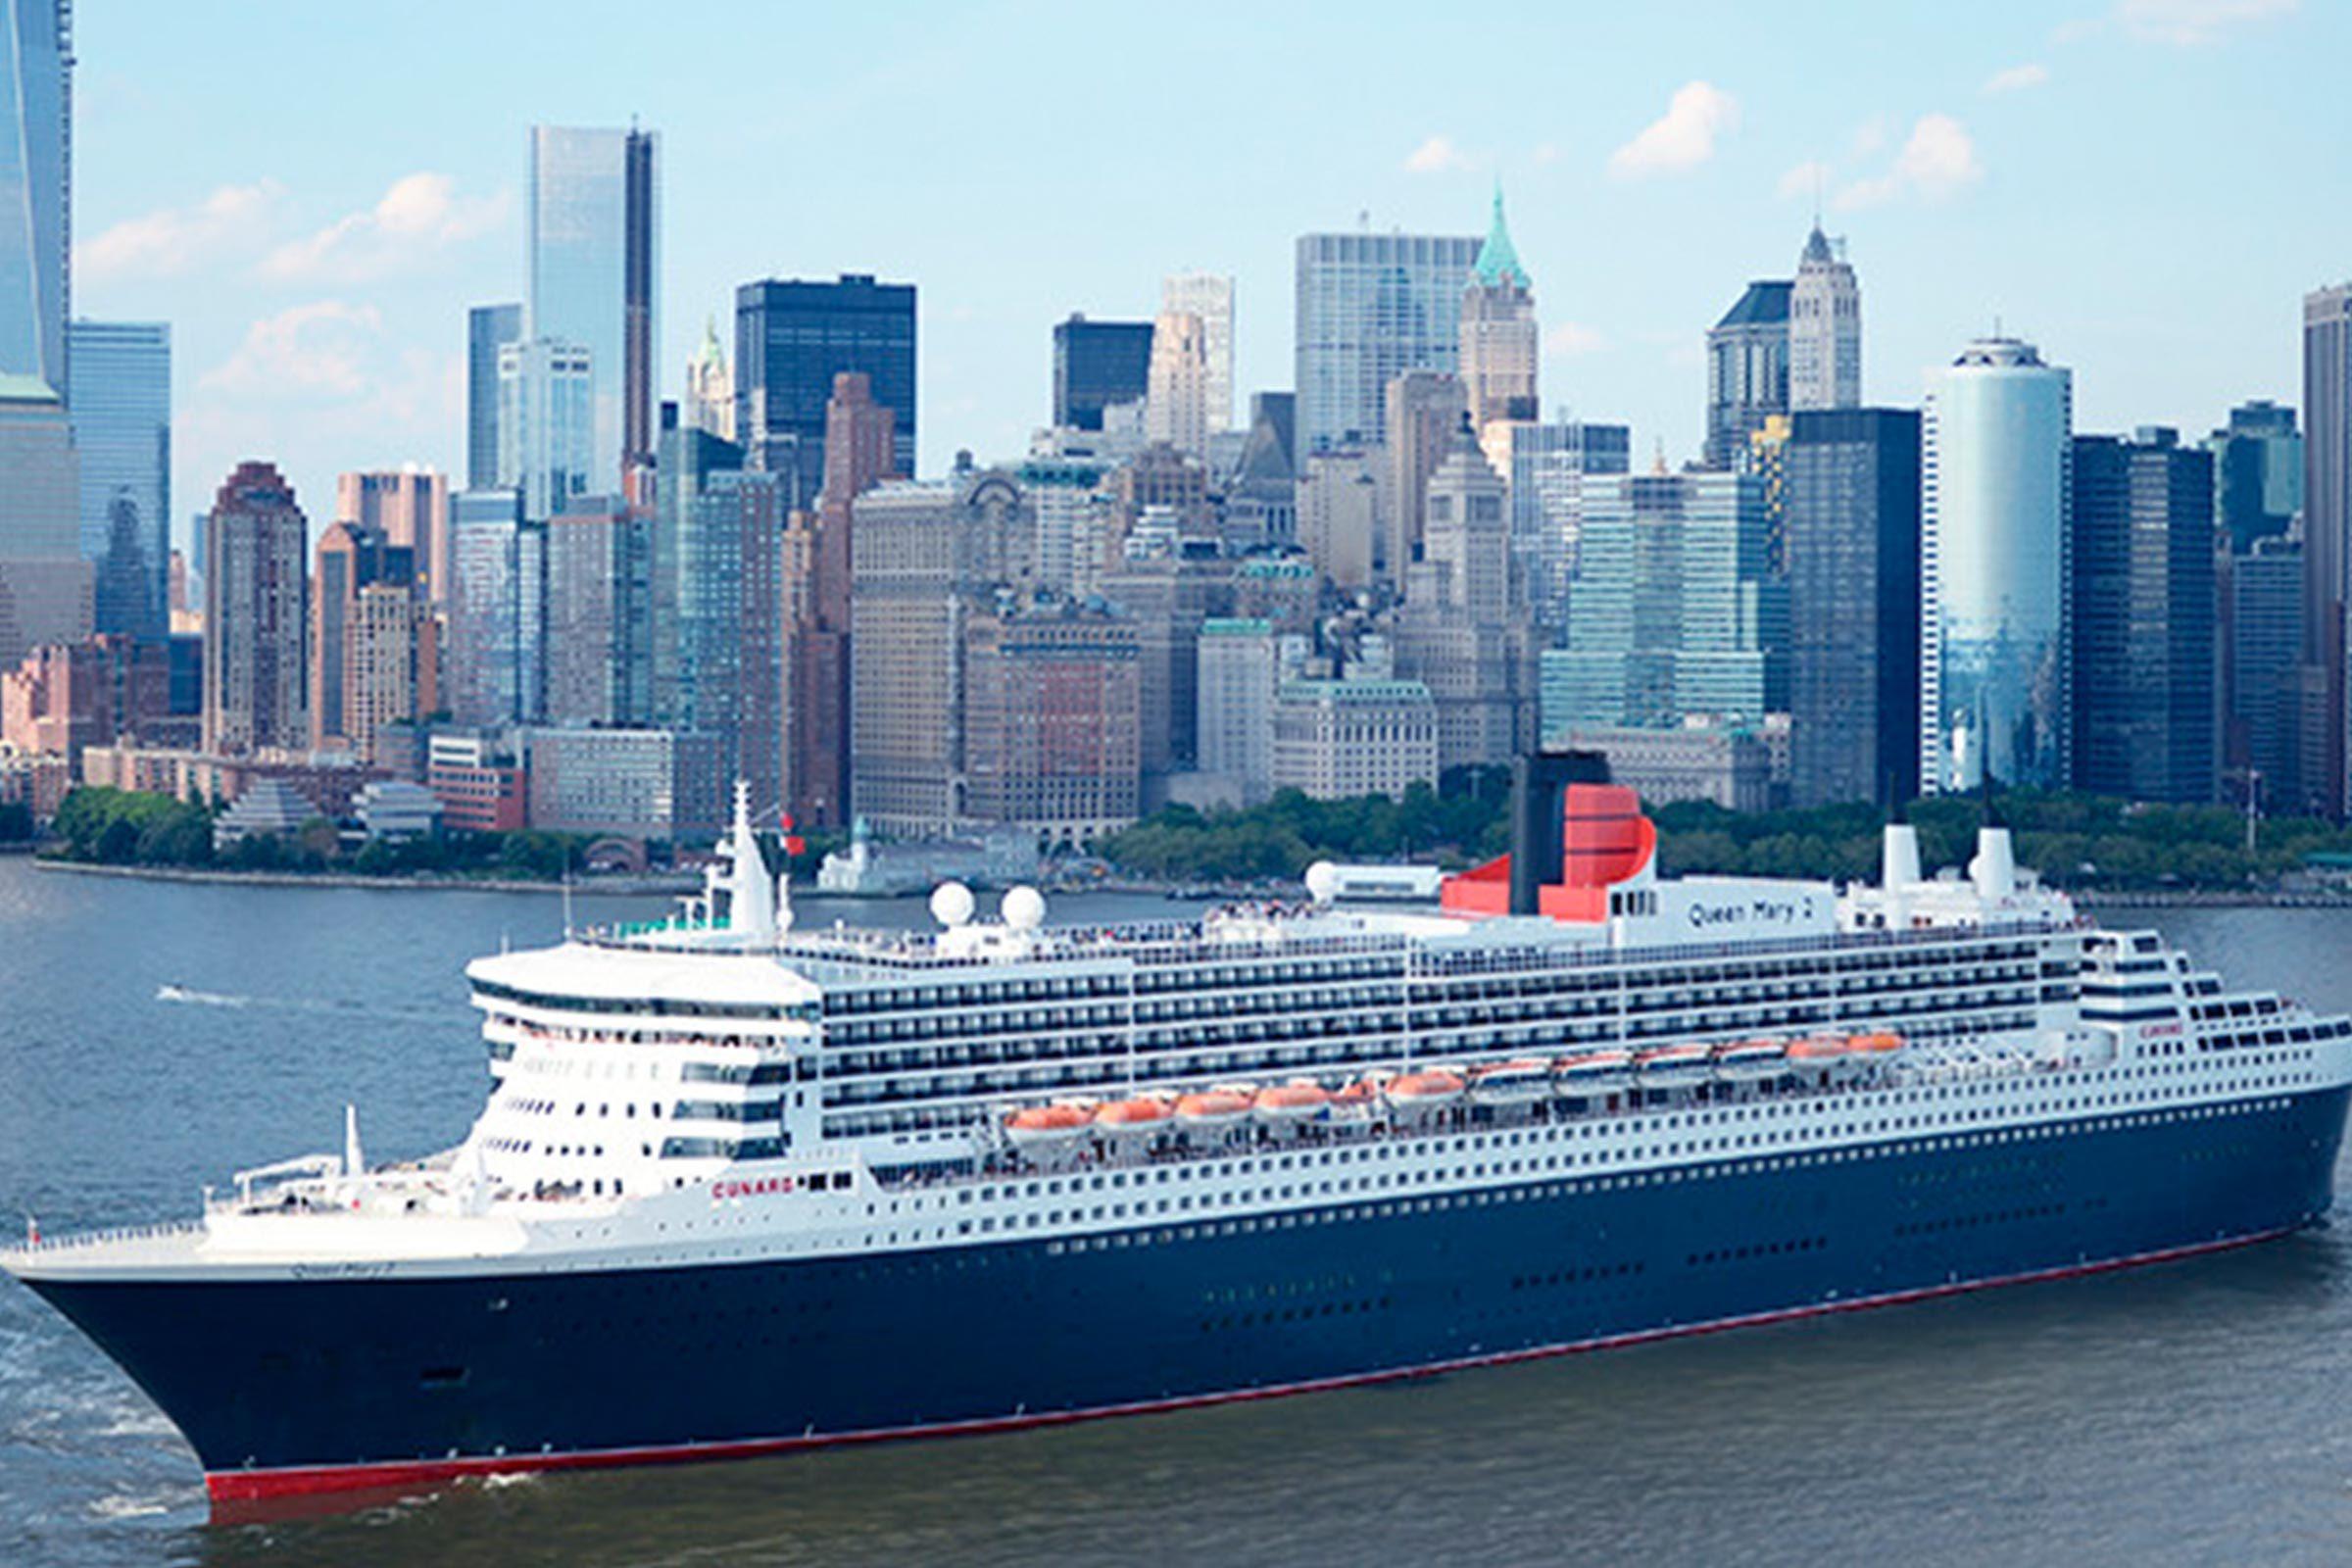 Cunard Queen Mary 2 Transatlantic